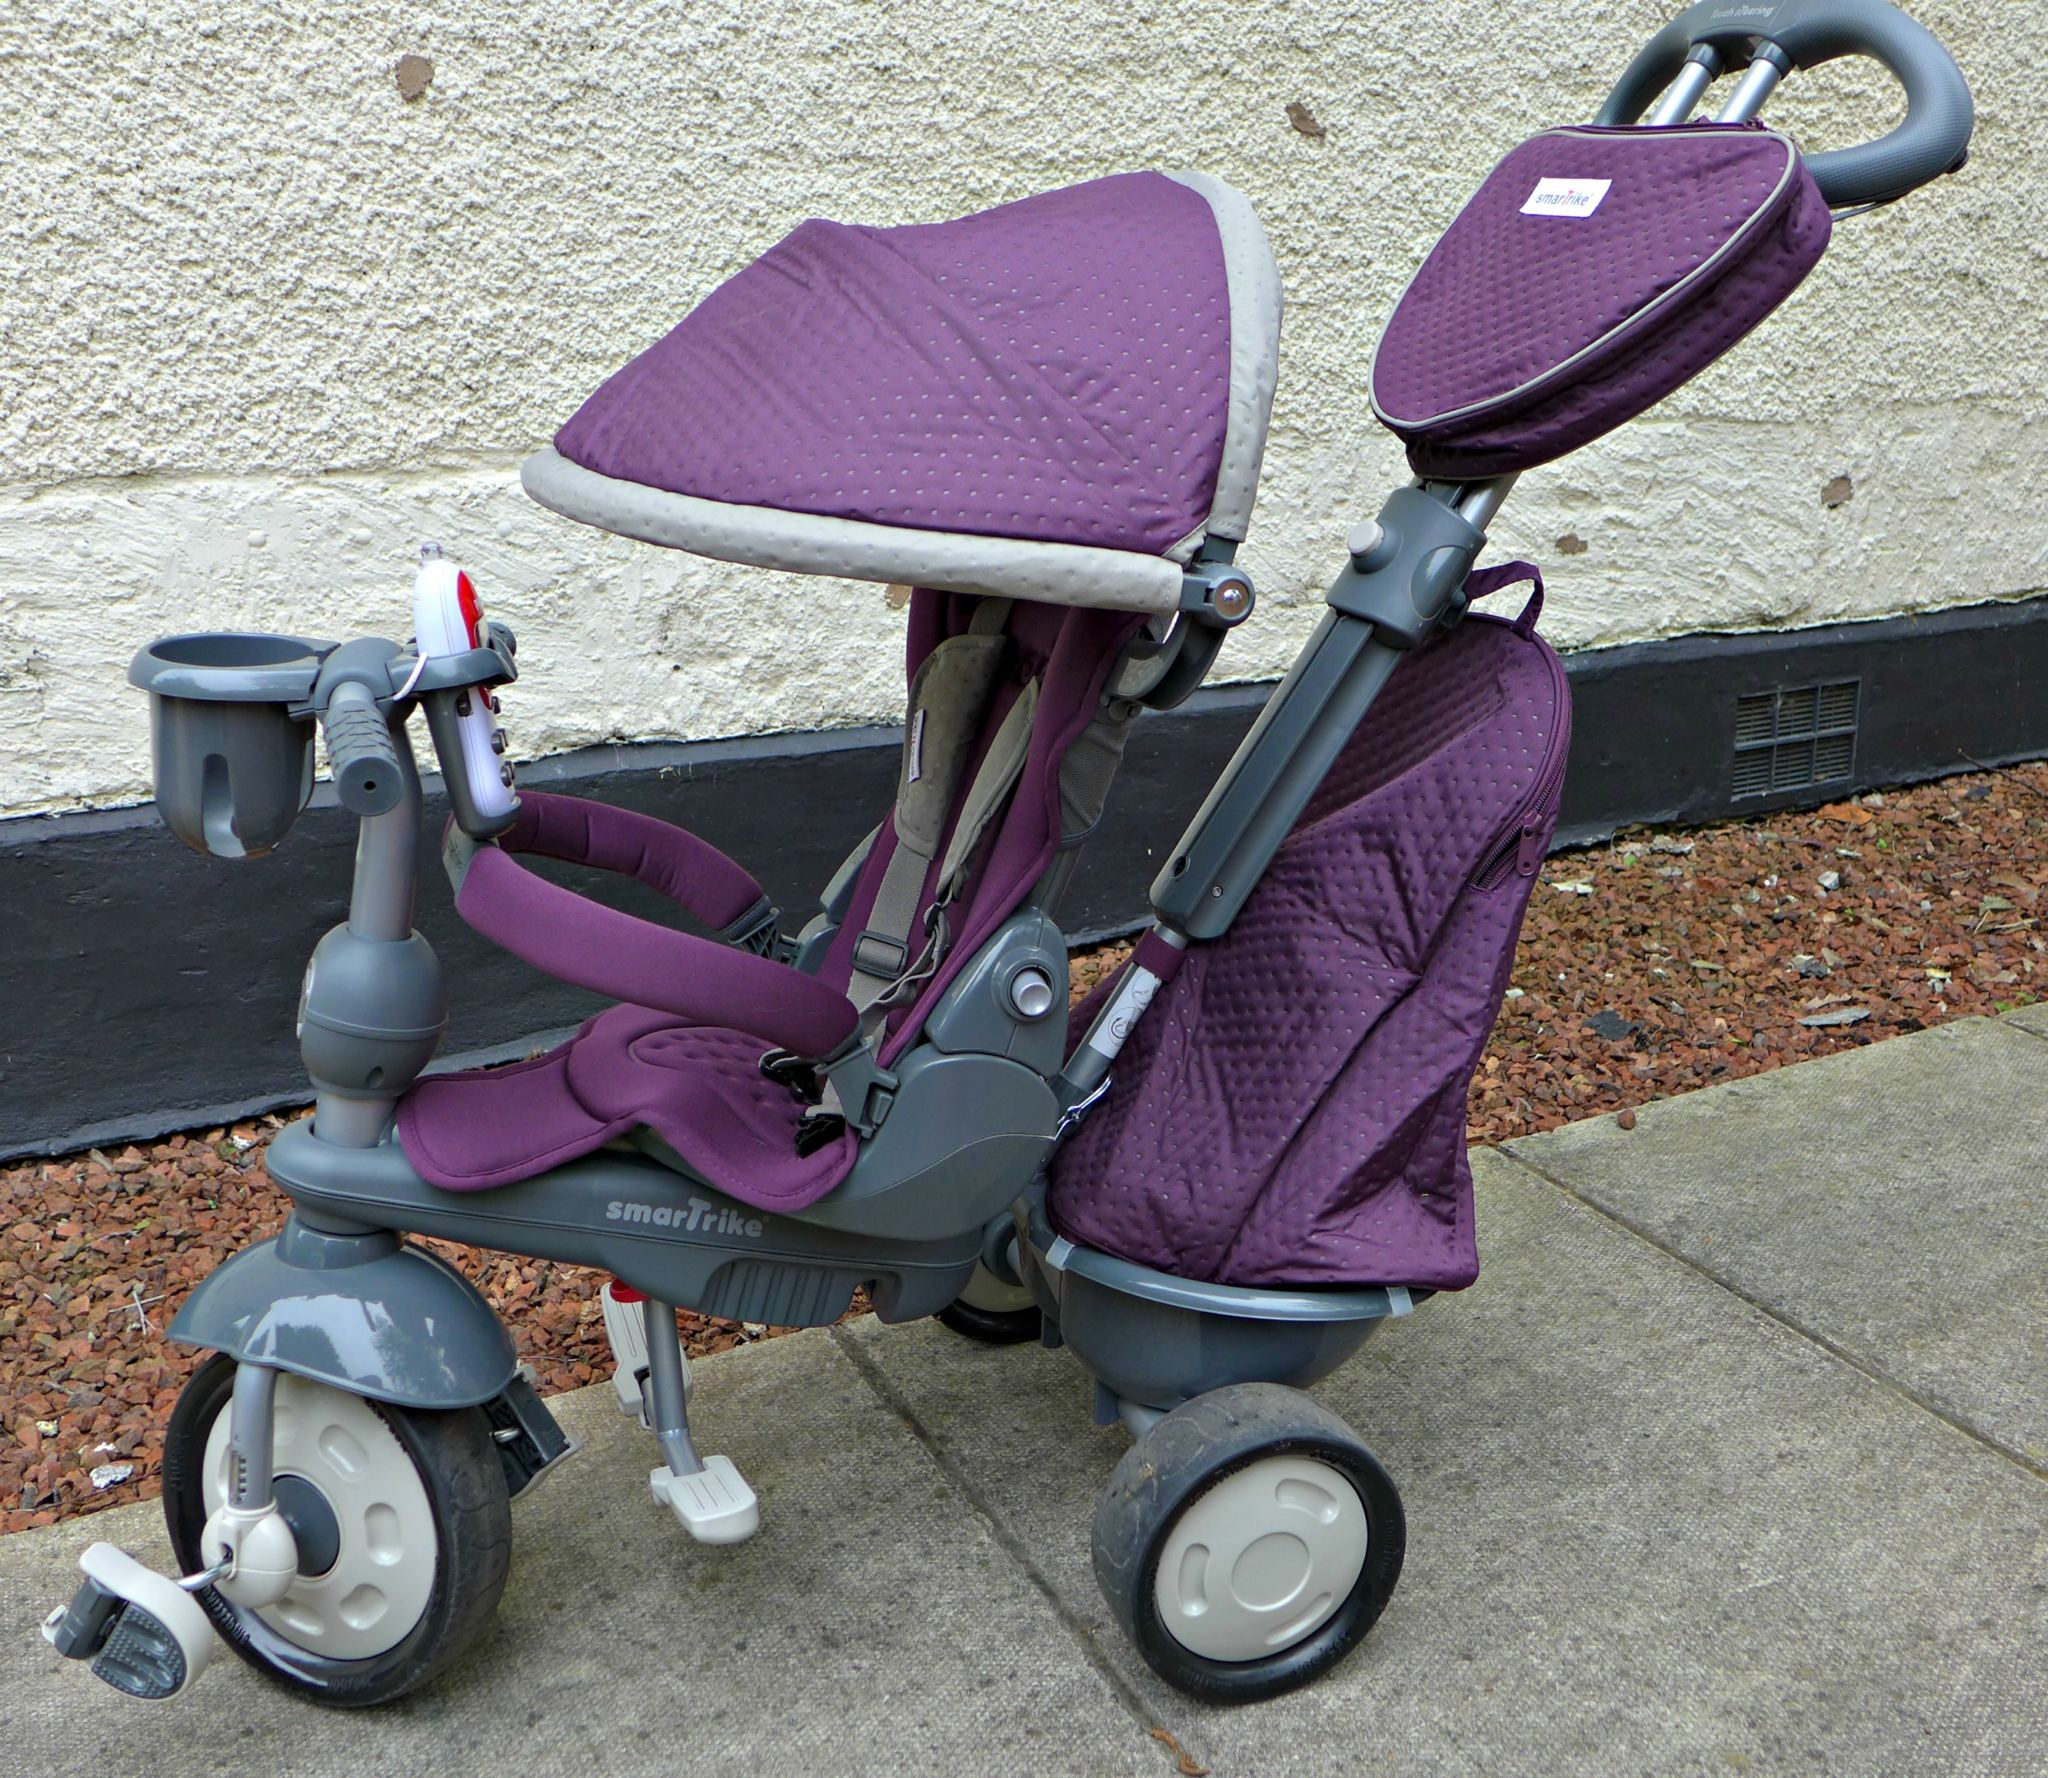 Smart Trike Recliner Stroller Smart Trike Recliner Child